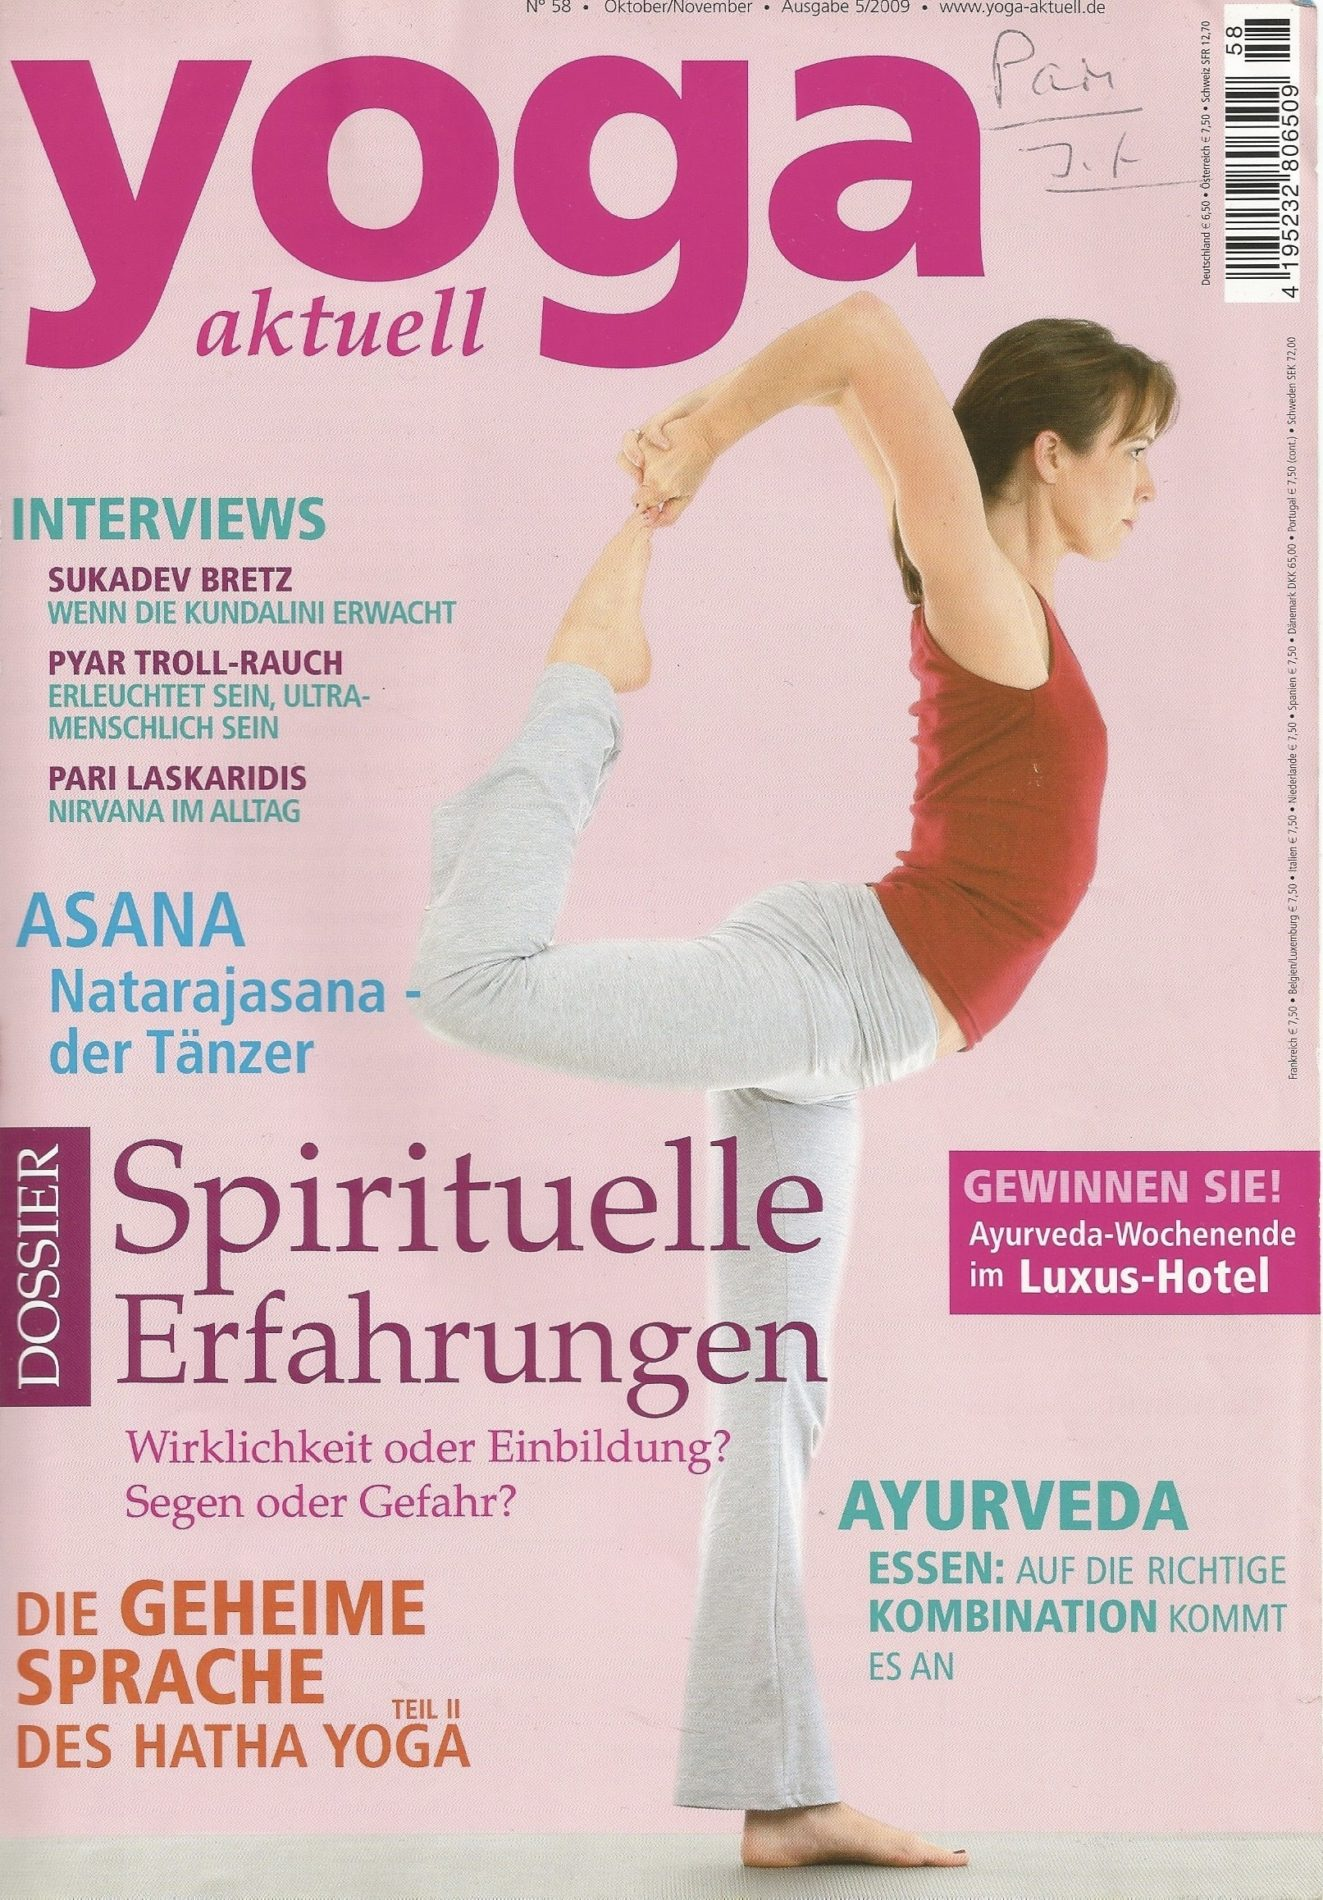 Yoga Aktuell – Nirvana im Alltag